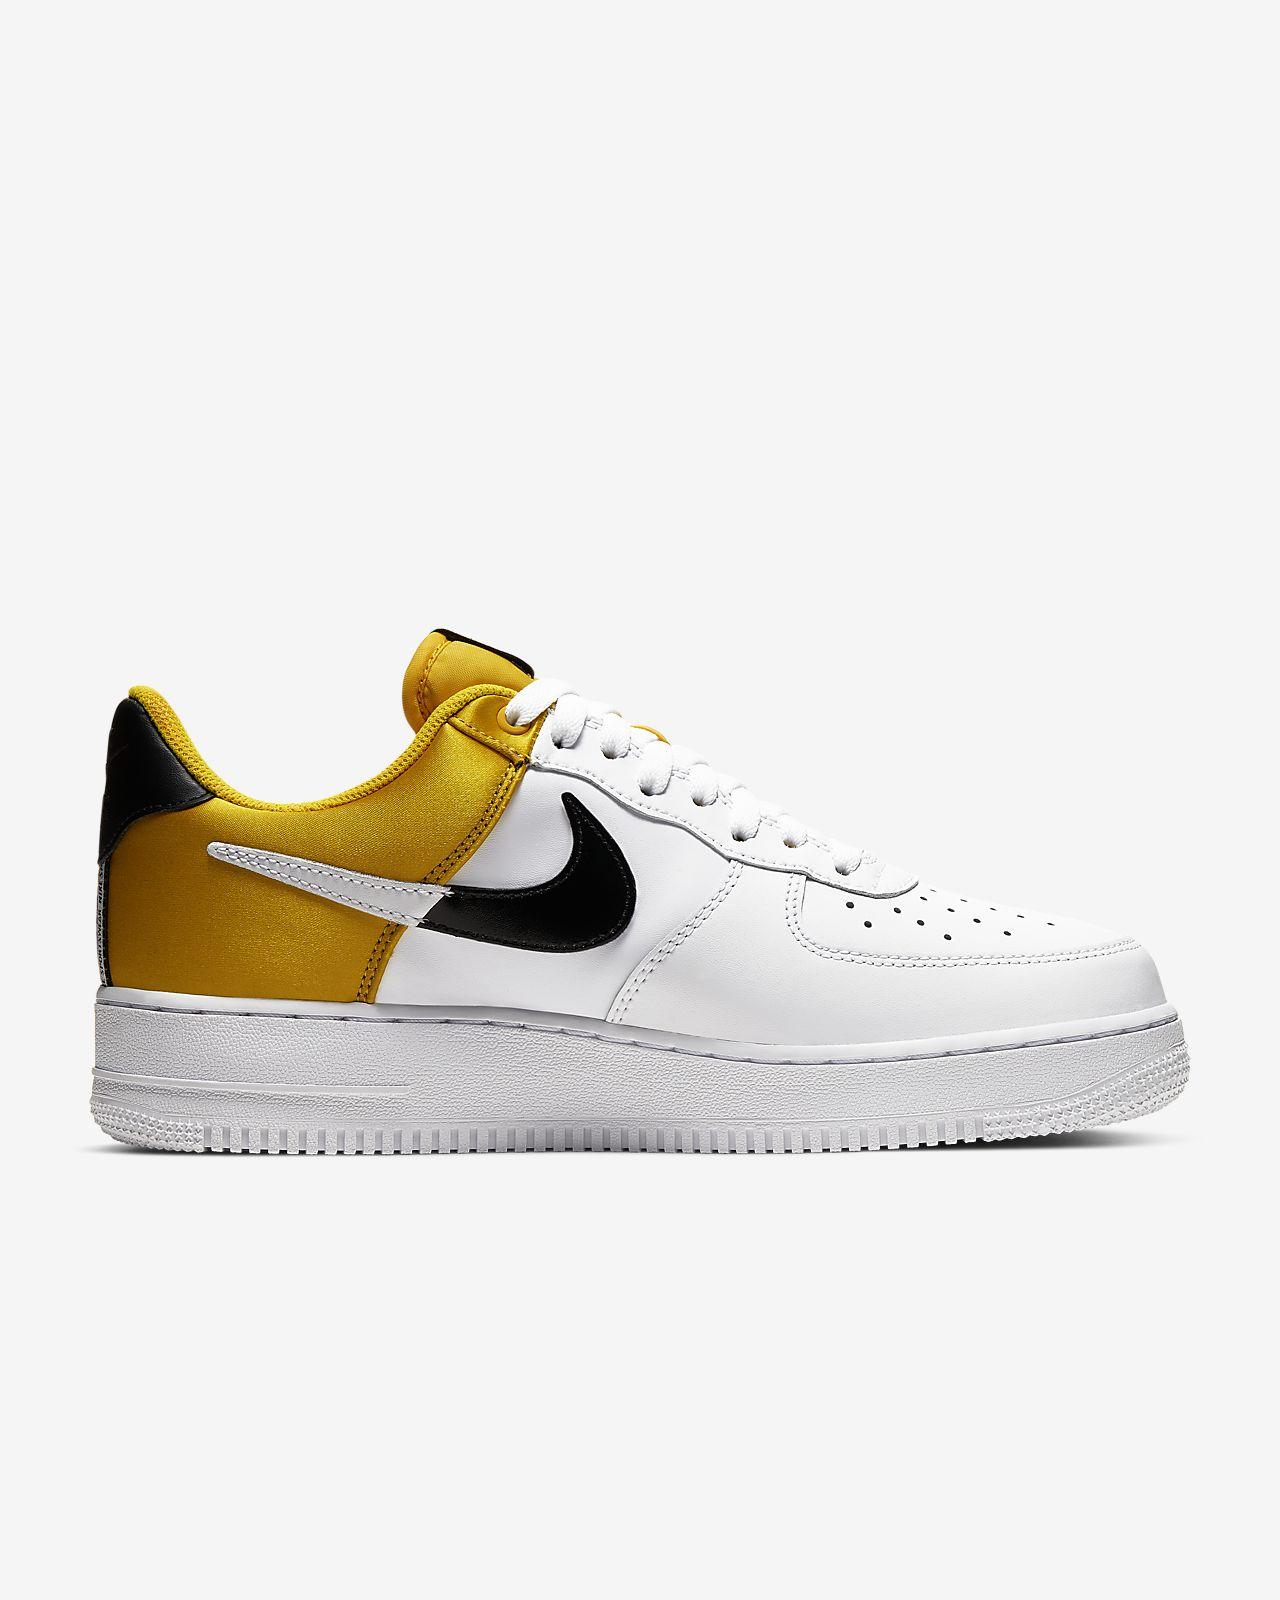 Calzado Nike Air Force 1 NBA Low